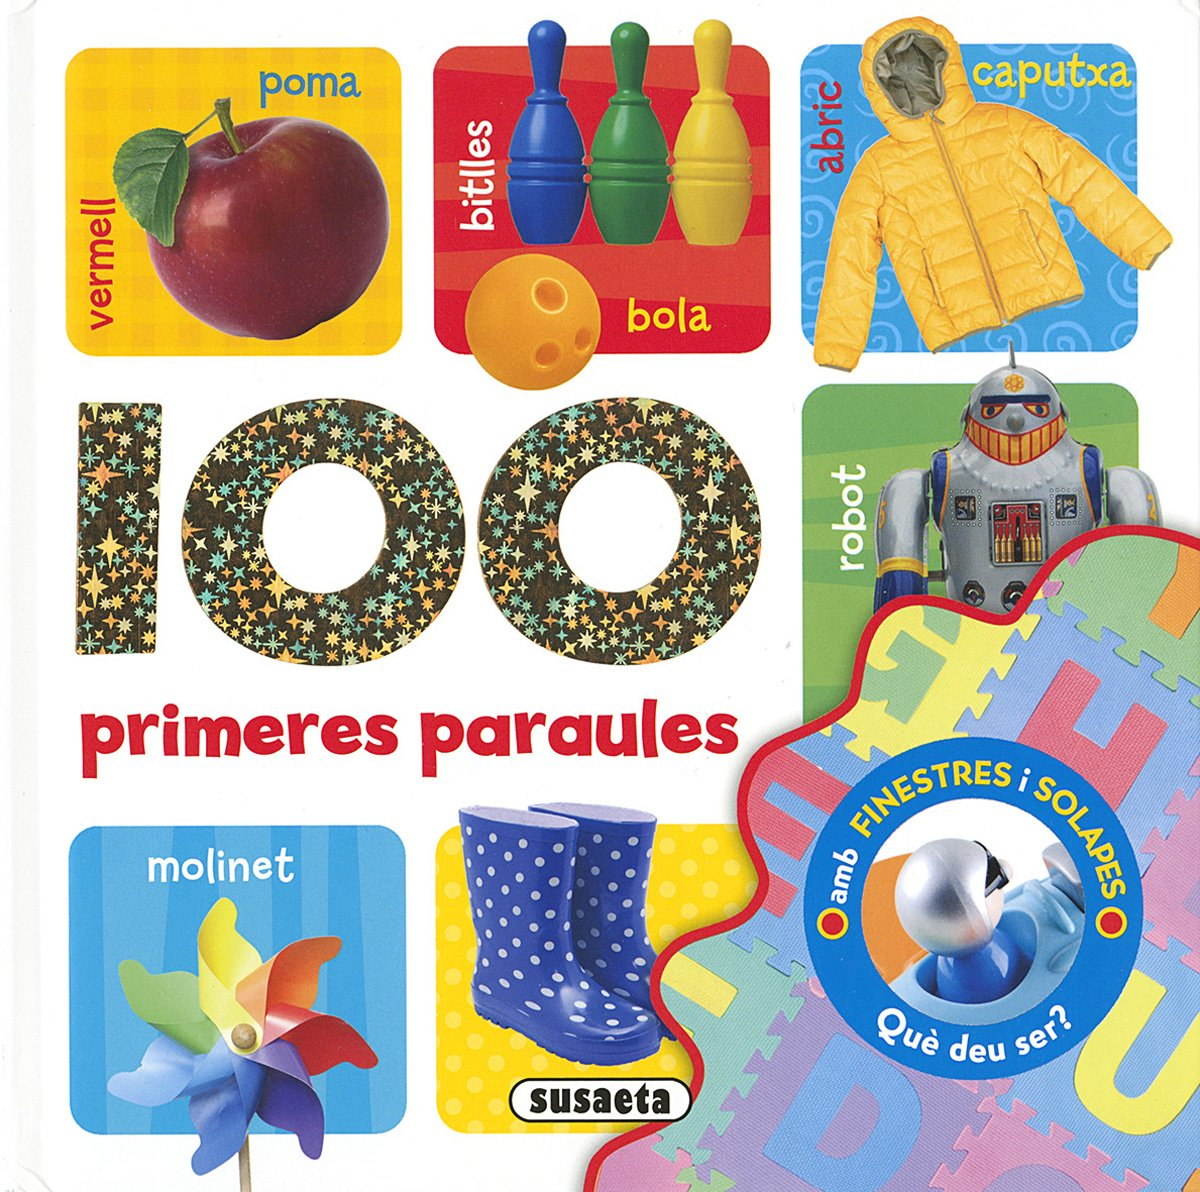 100 Paraules. Primeres paraules (Catalan) Hardcover – April 1, 2016